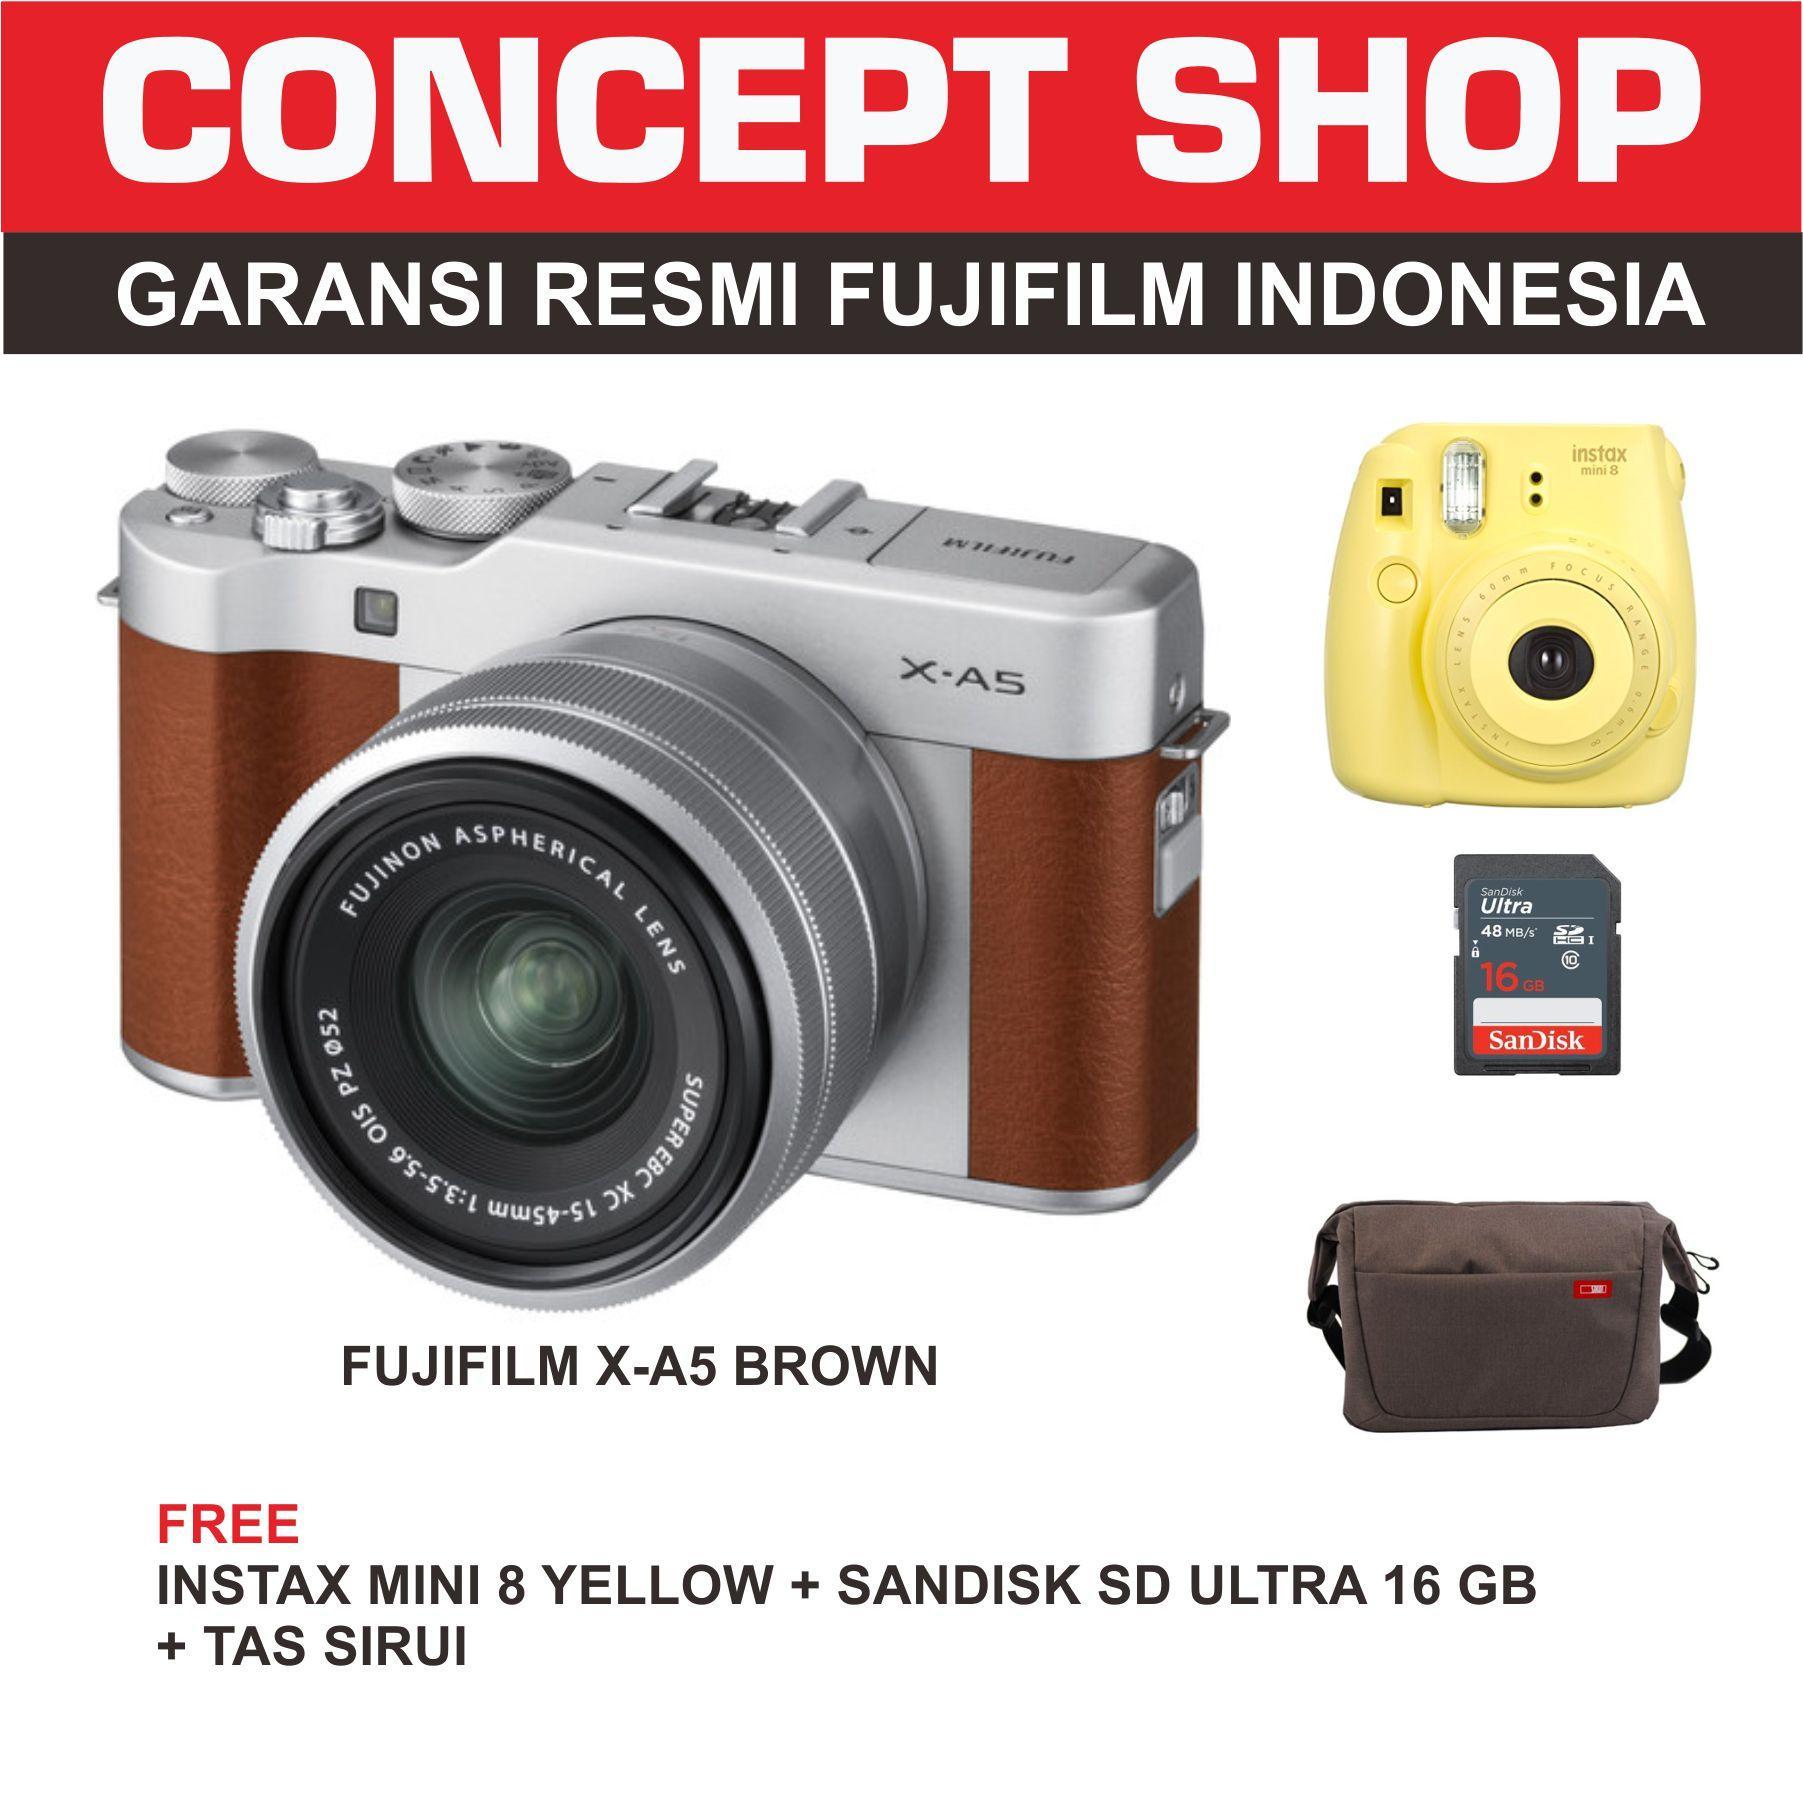 Kelebihan Fujifilm X A5 Kit 15 45mm Brown Xa5 Xa 5 Terkini Daftar Instax Mini 8 Garansi Resmi Indonesia Kuning Detail Gambar Terbaru